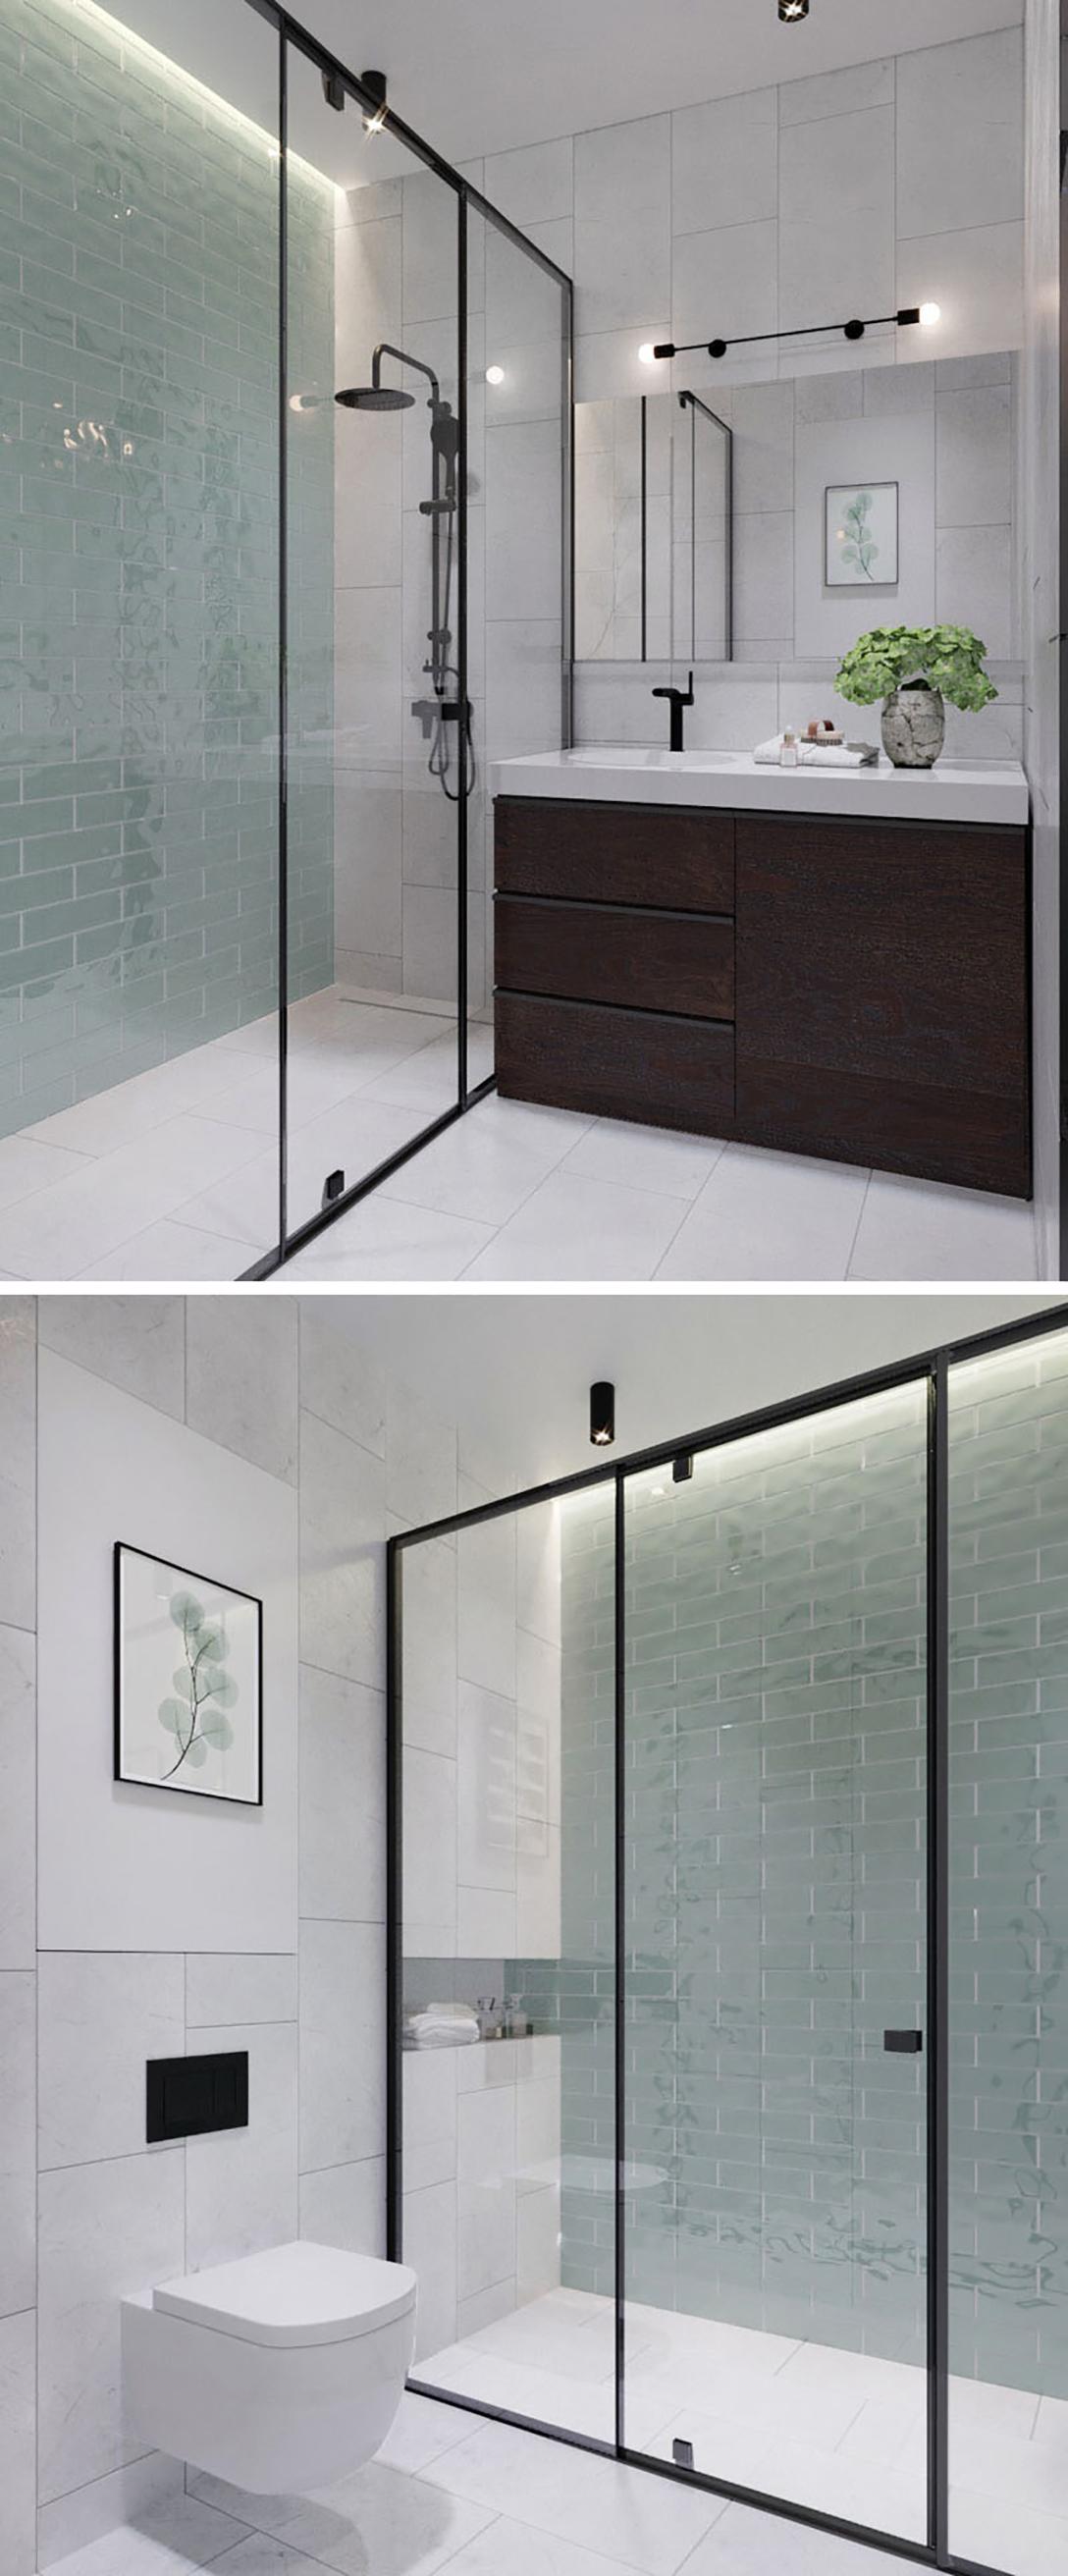 modern-bathroom-black-frame-glass-shower-surround-170517-926-06-2